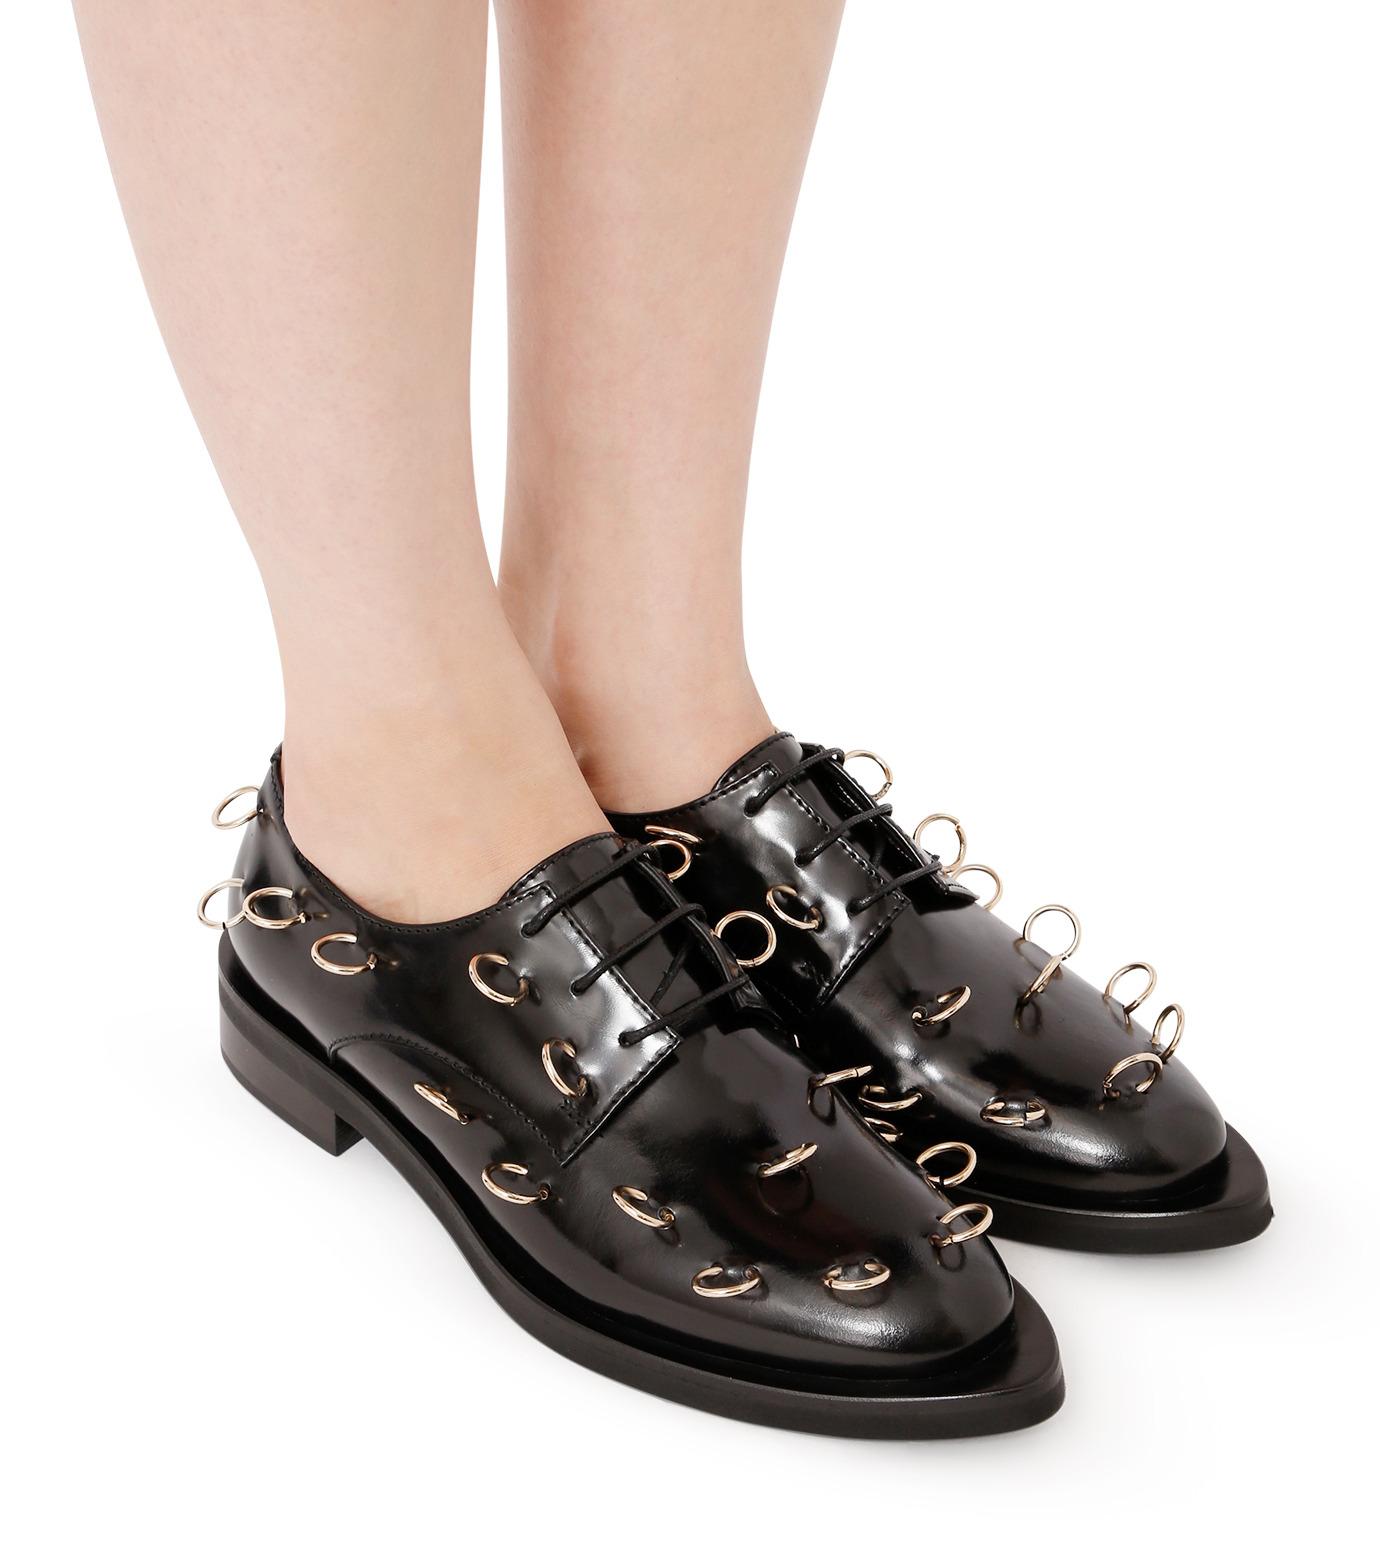 Coliac(コリアック)のRei Rings-BLACK(フラットシューズ/Flat shoes)-64CC023-13 拡大詳細画像5